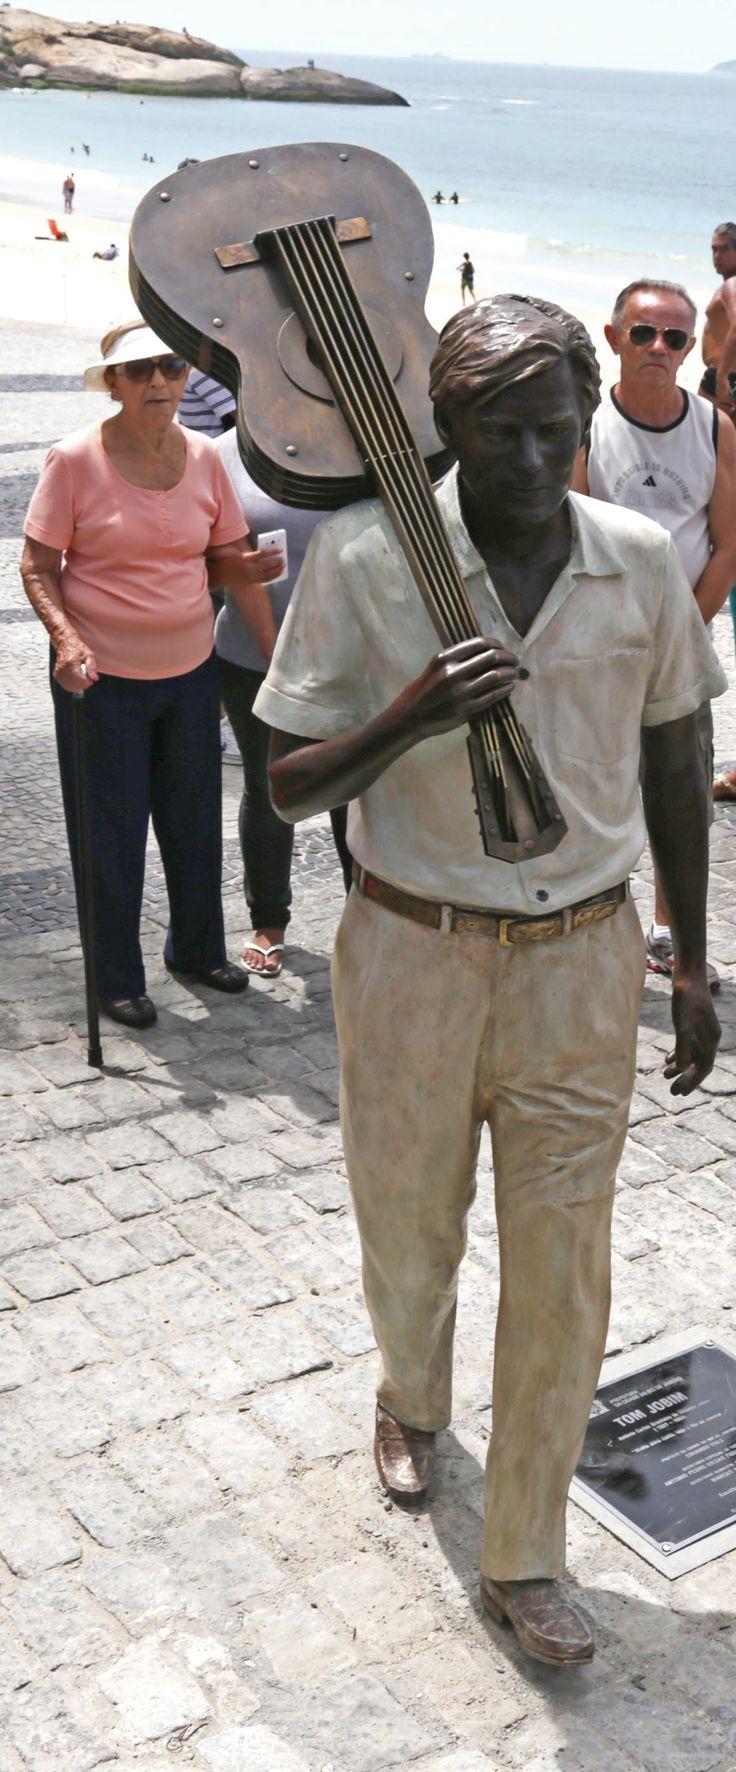 statue of musician and composer Antonio Carlos Jobim